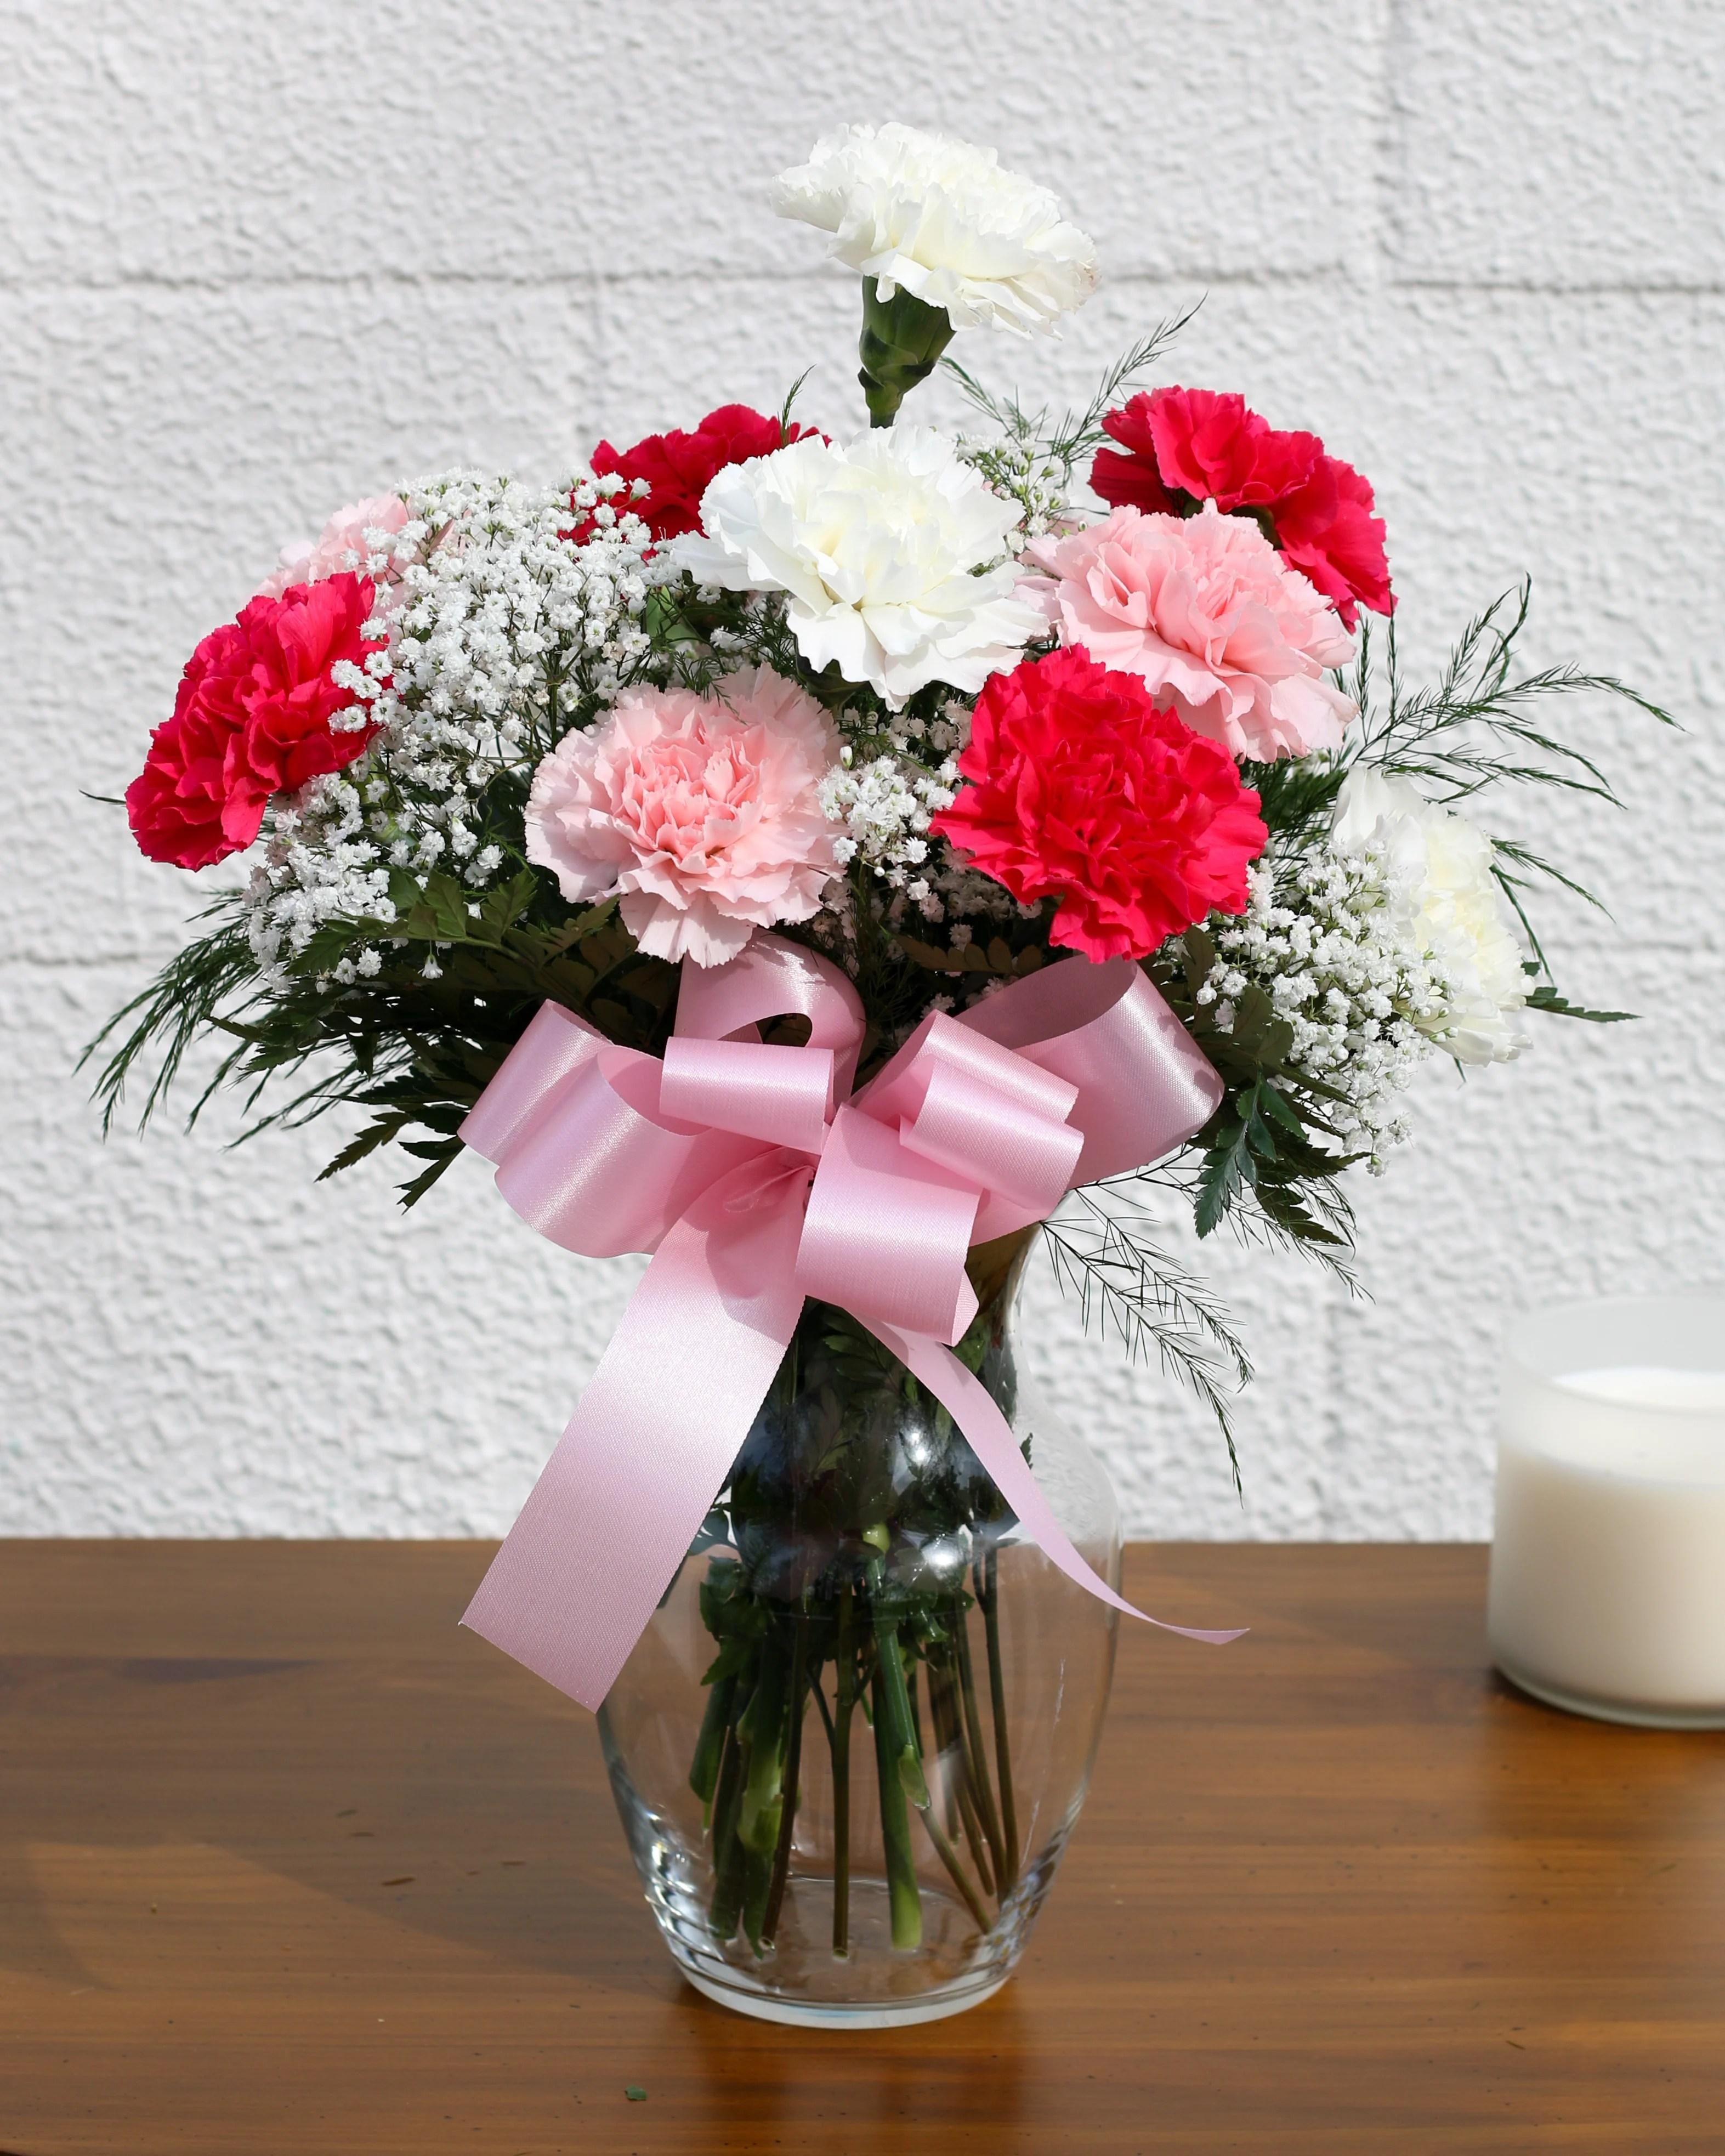 Pics Of Carnations : carnations, Dozen, Pretty, Carnations, FG208, Bensalem,, Flower, Florist